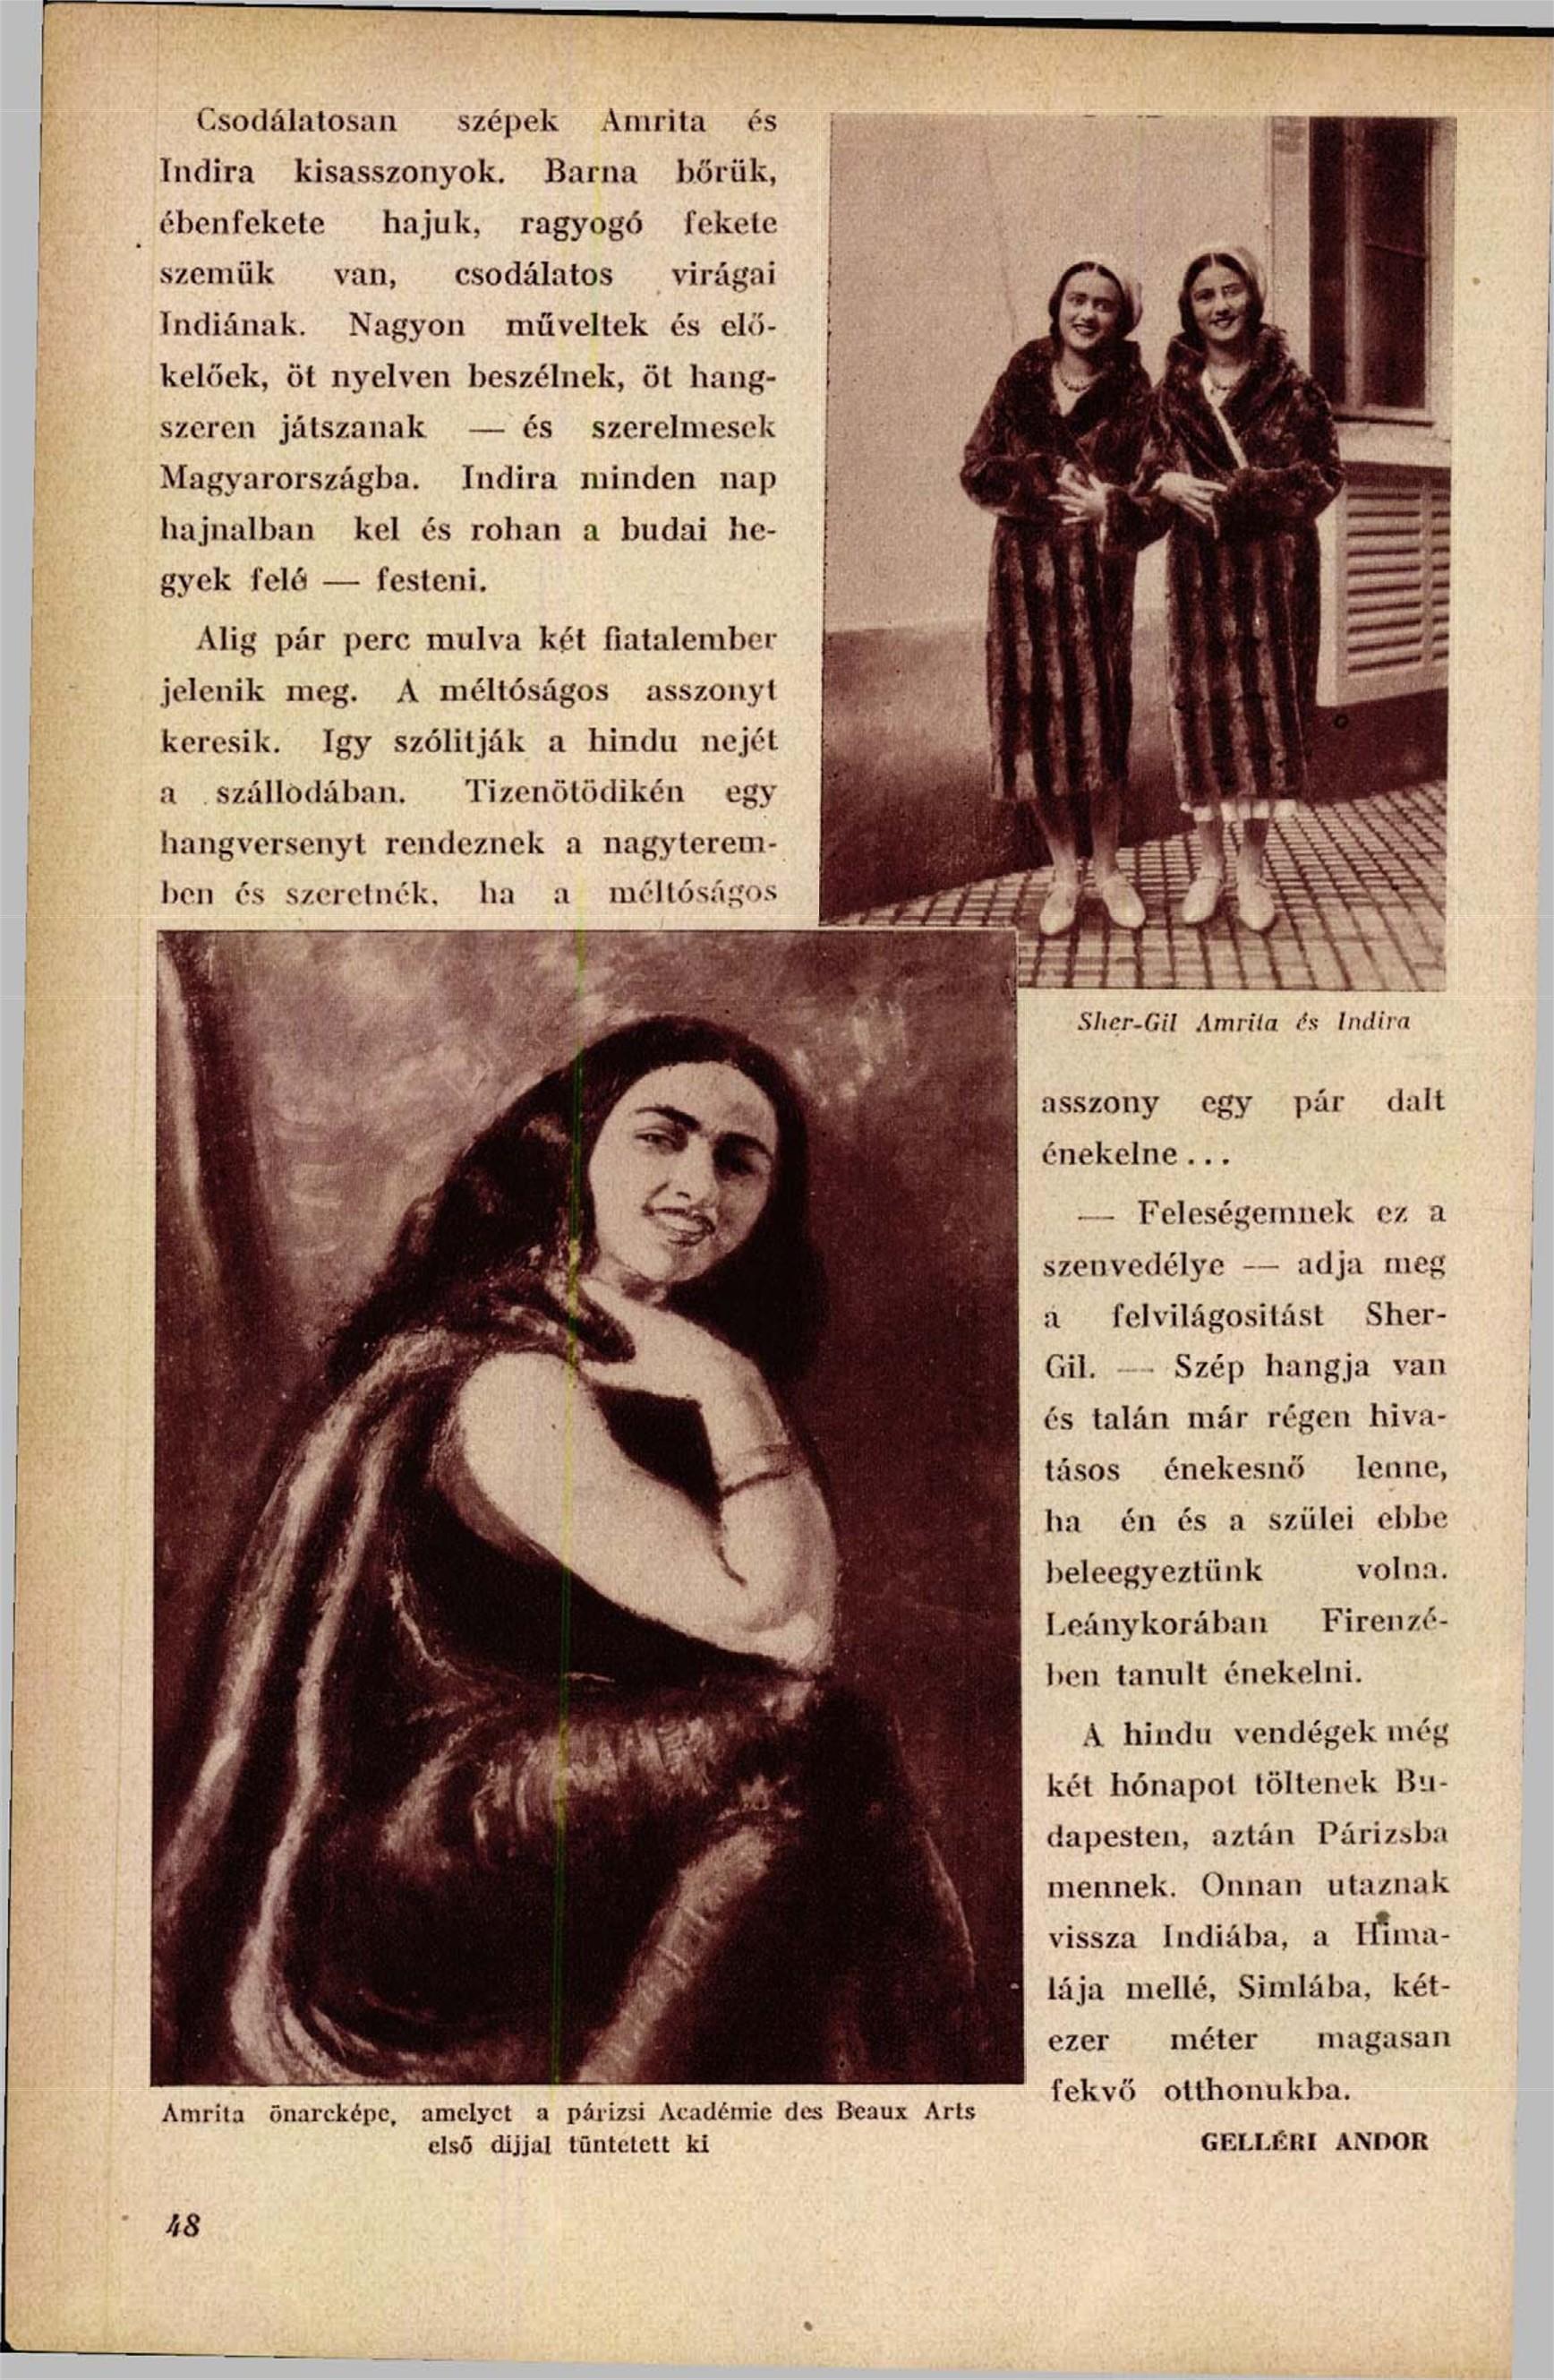 szinhazielet_1930_46_pages50-50.jpg